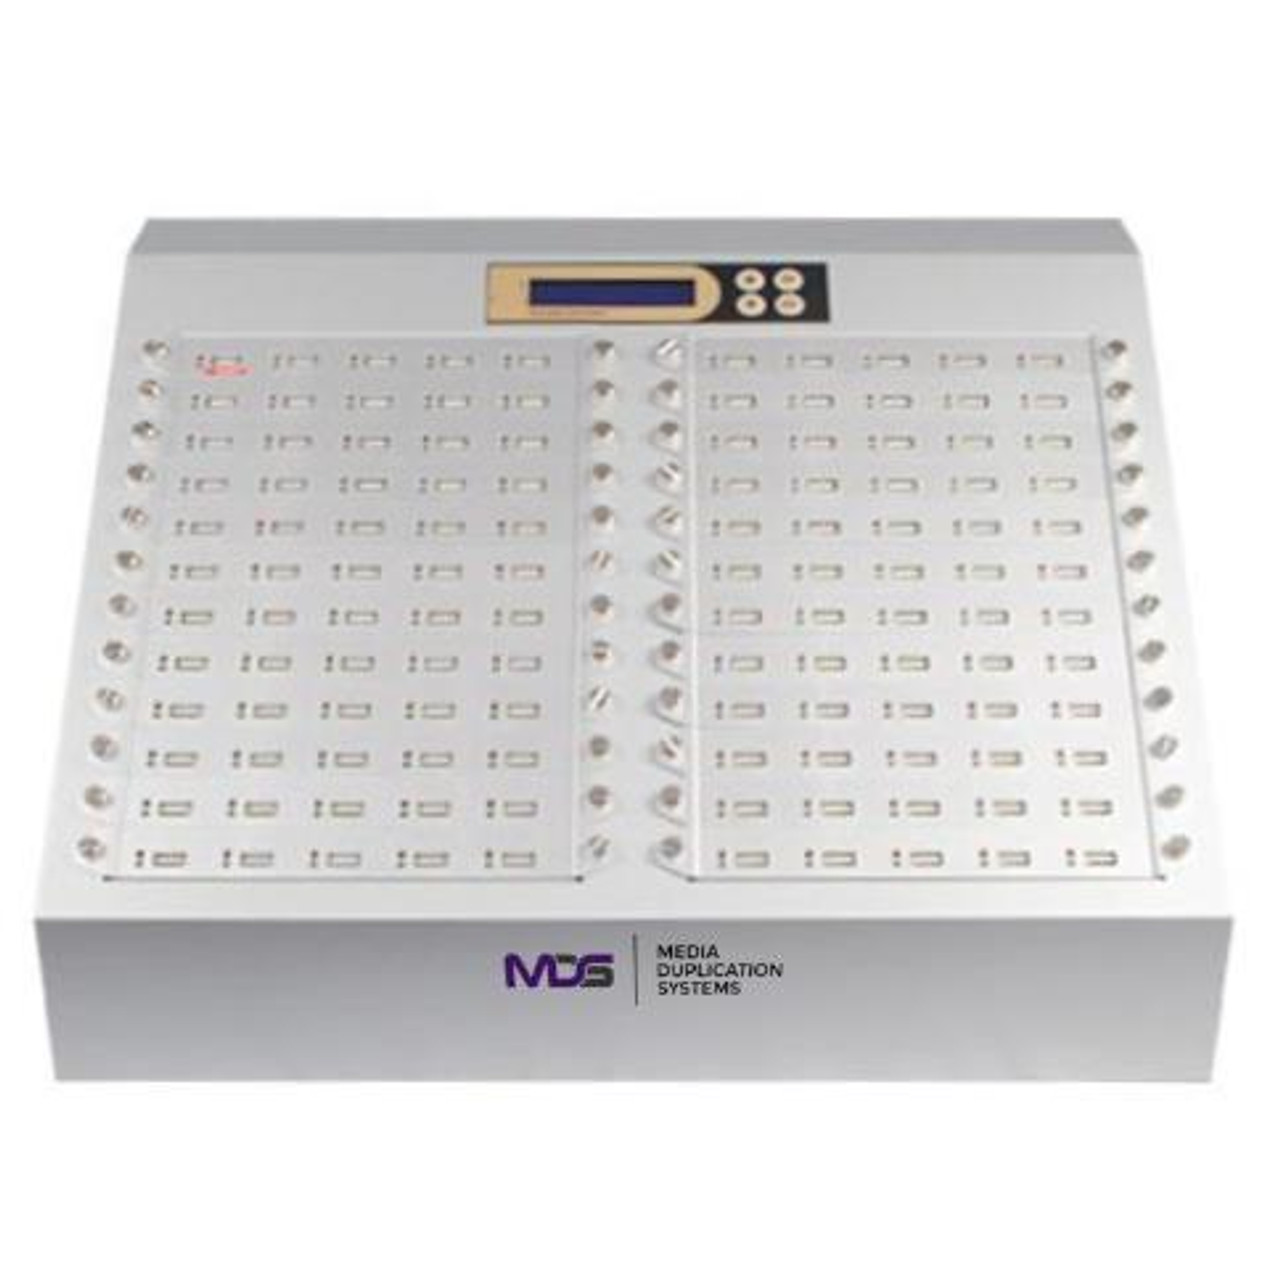 XpressHDD-Pro 1 to 119 External/Portable USB HDD/SSD Duplicator